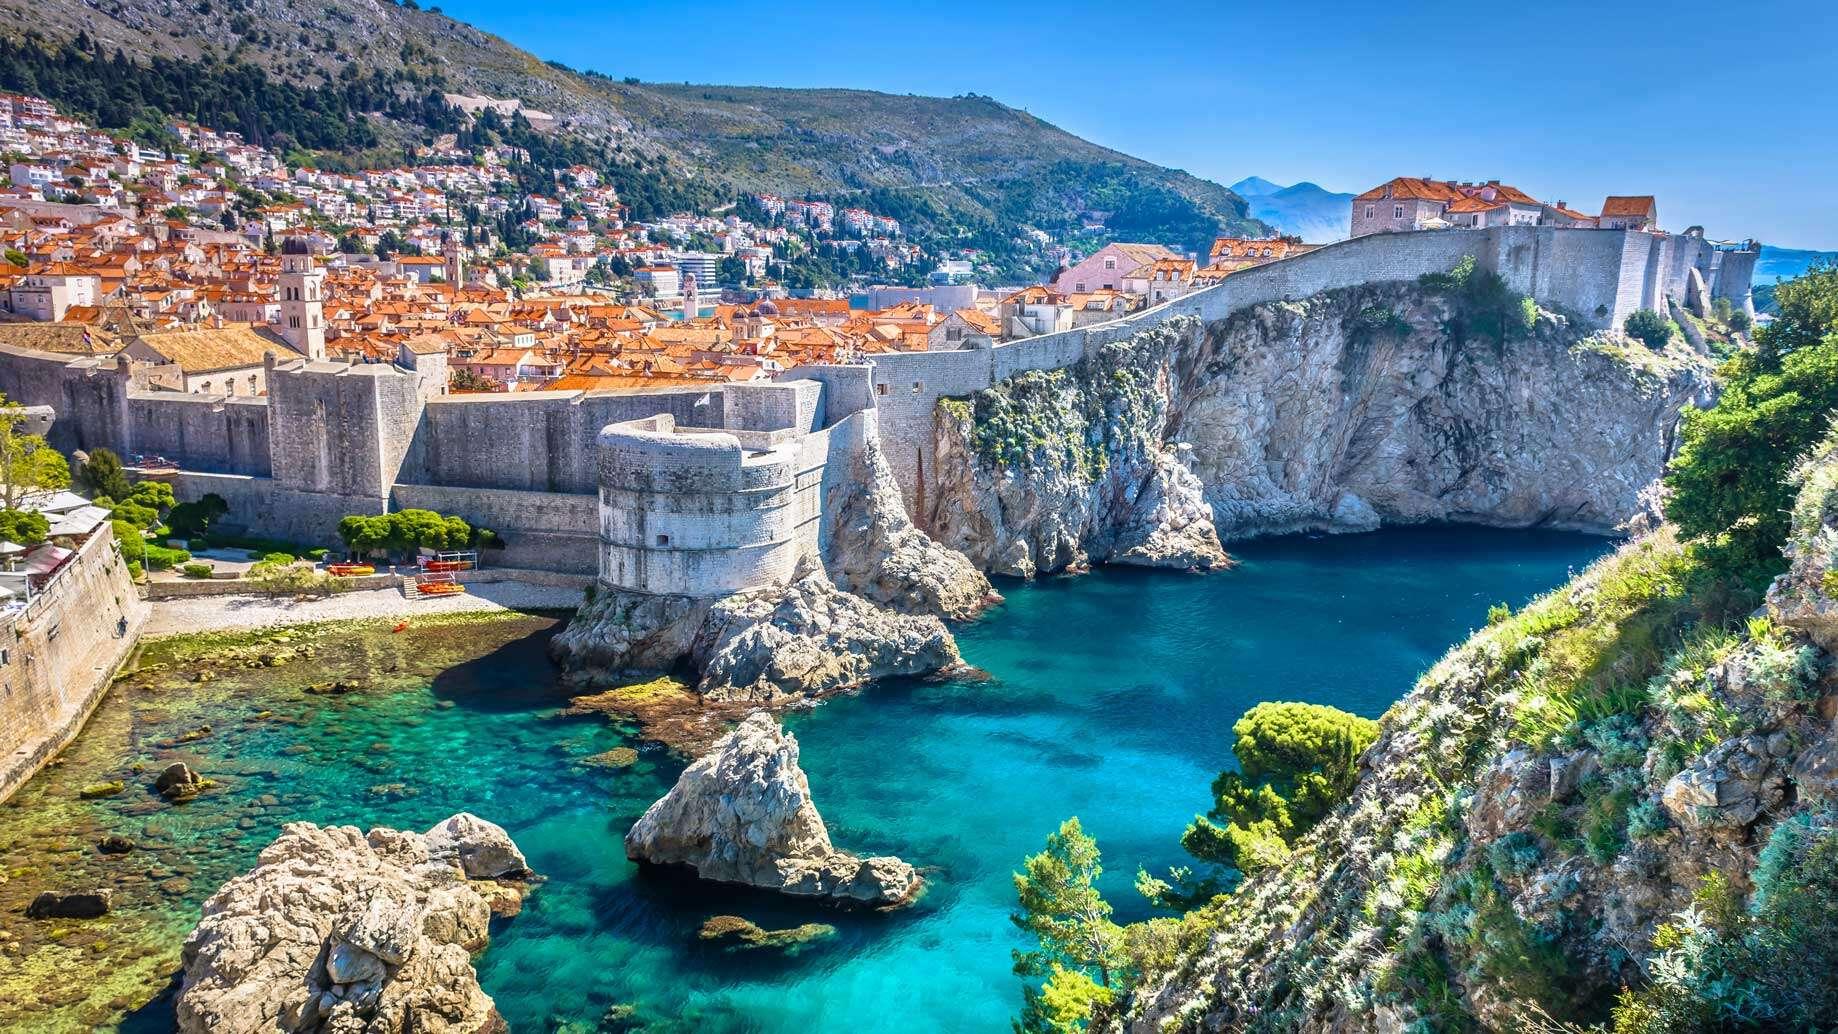 Country Roads of Croatia May 7 - May 20, 2022